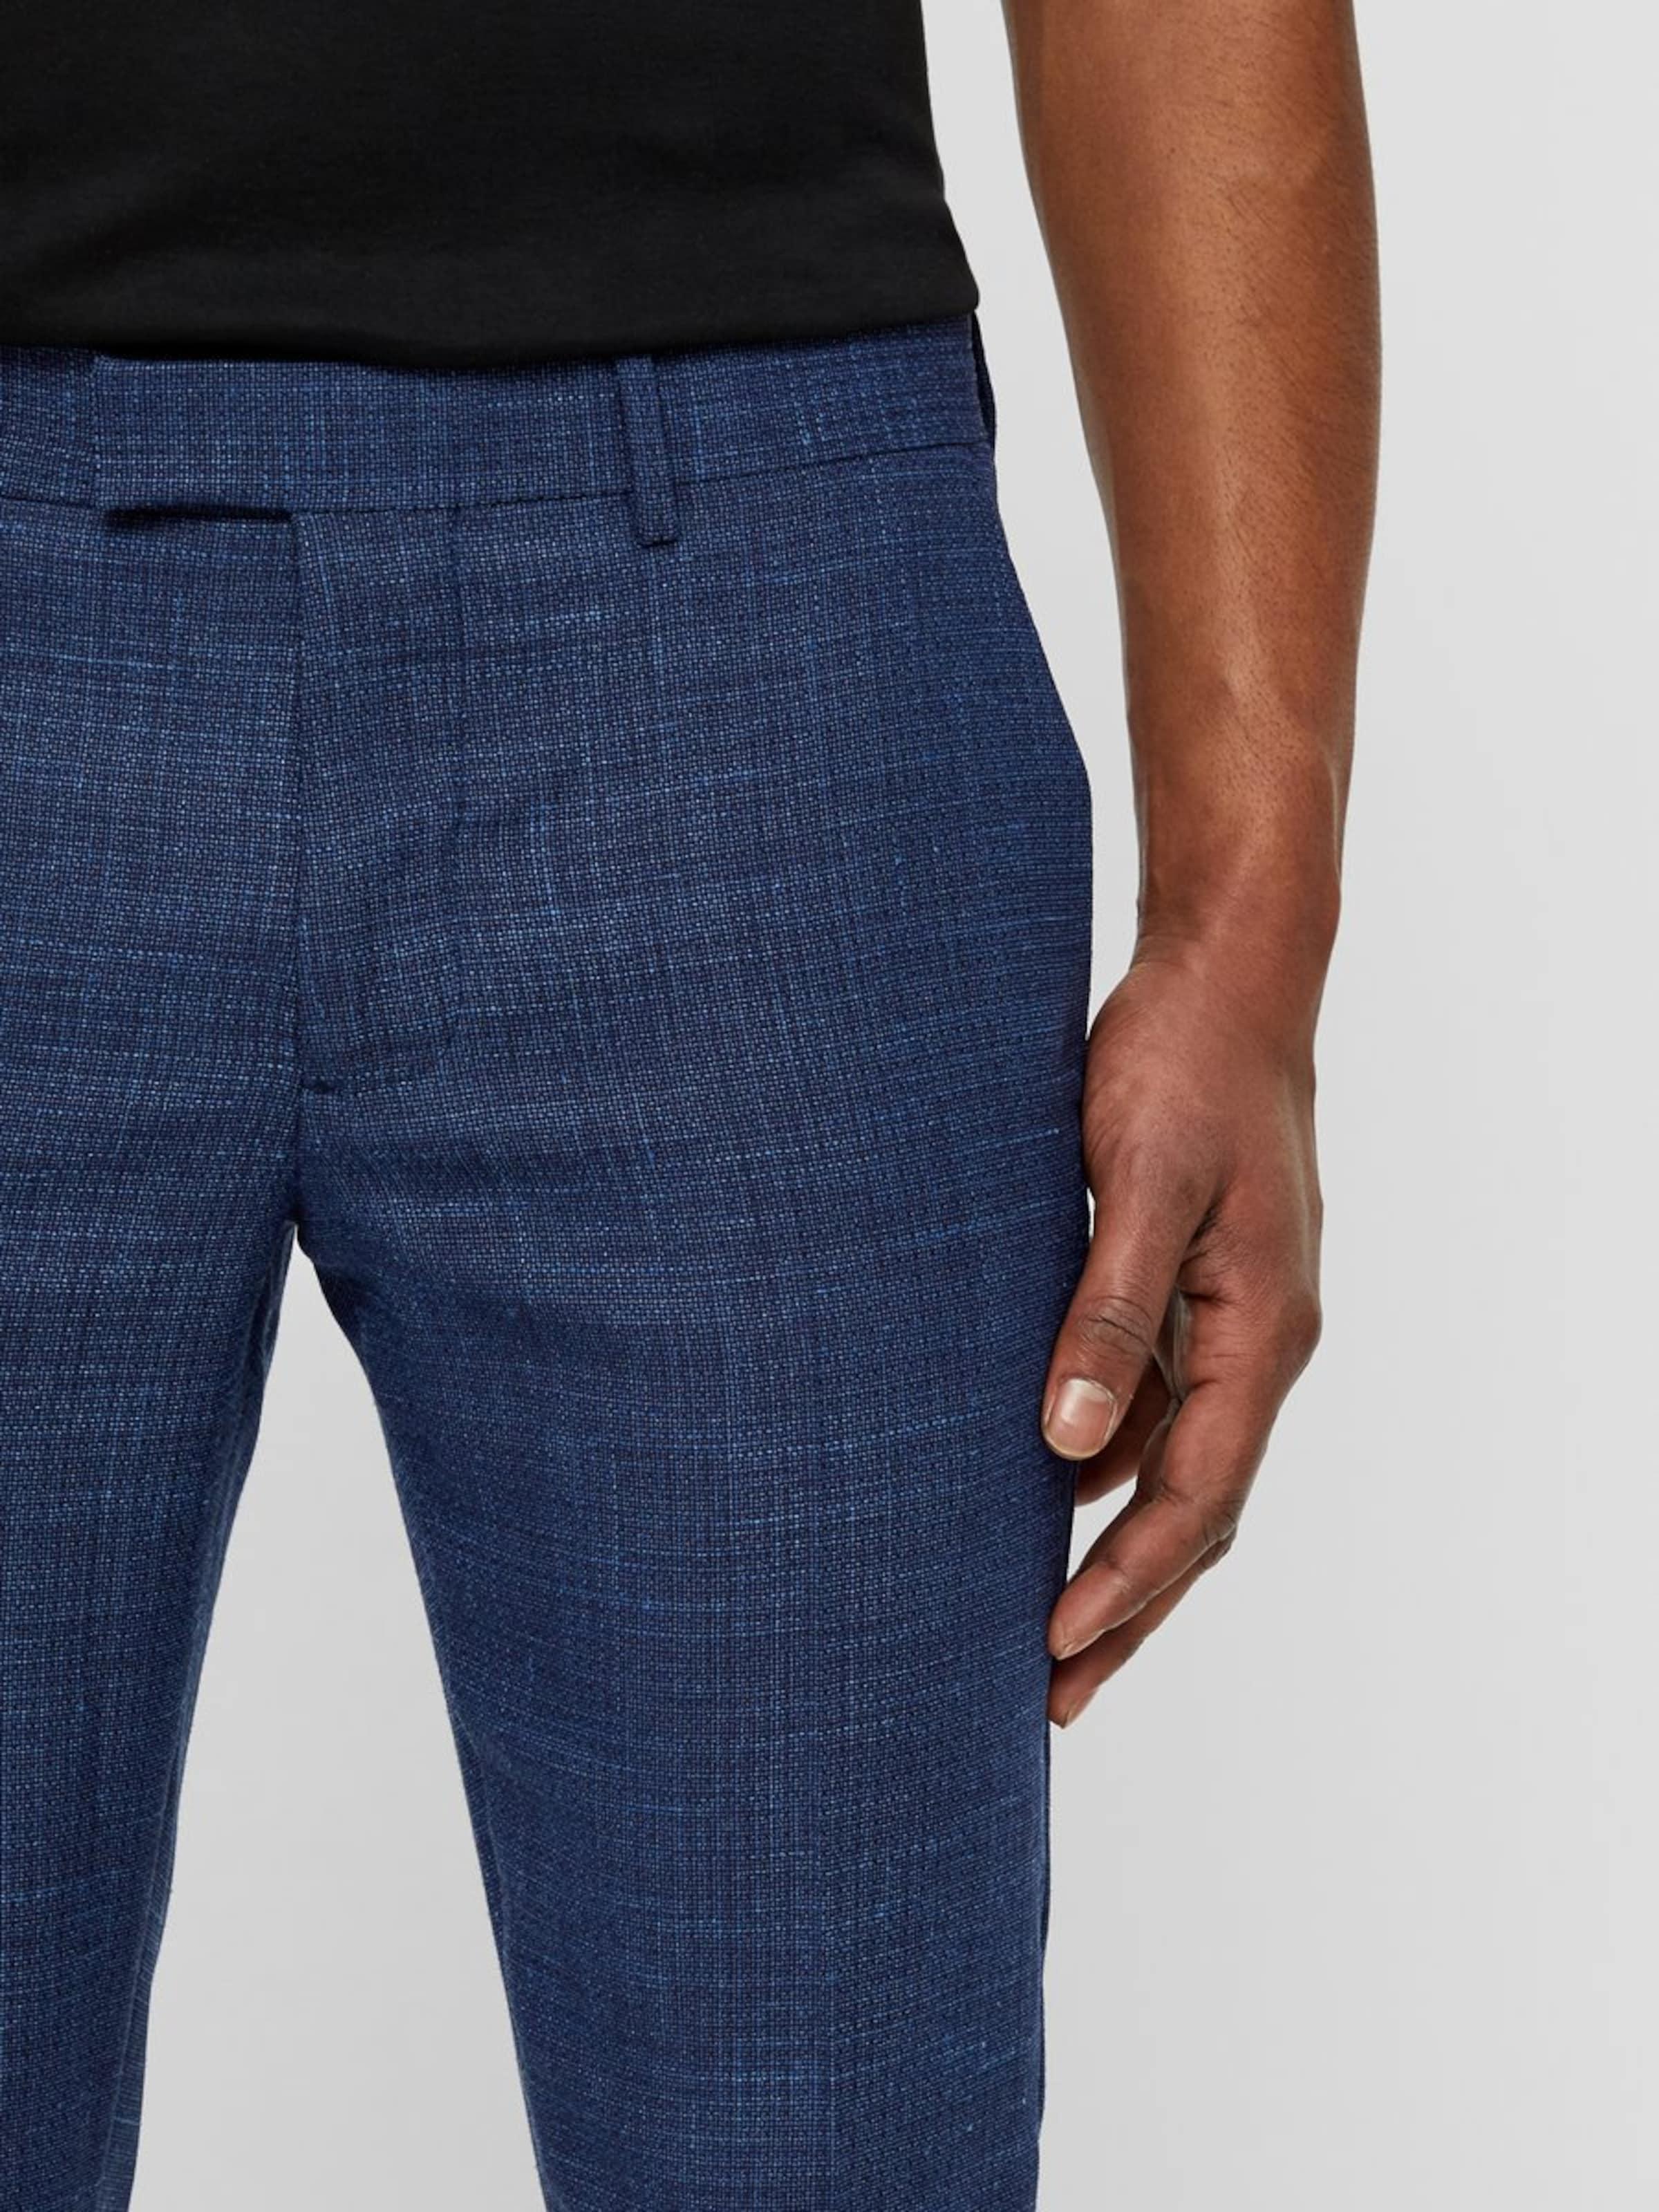 Plis J lindeberg En Bleu Pantalon À 'grant' Foncé SzMVLqUpG